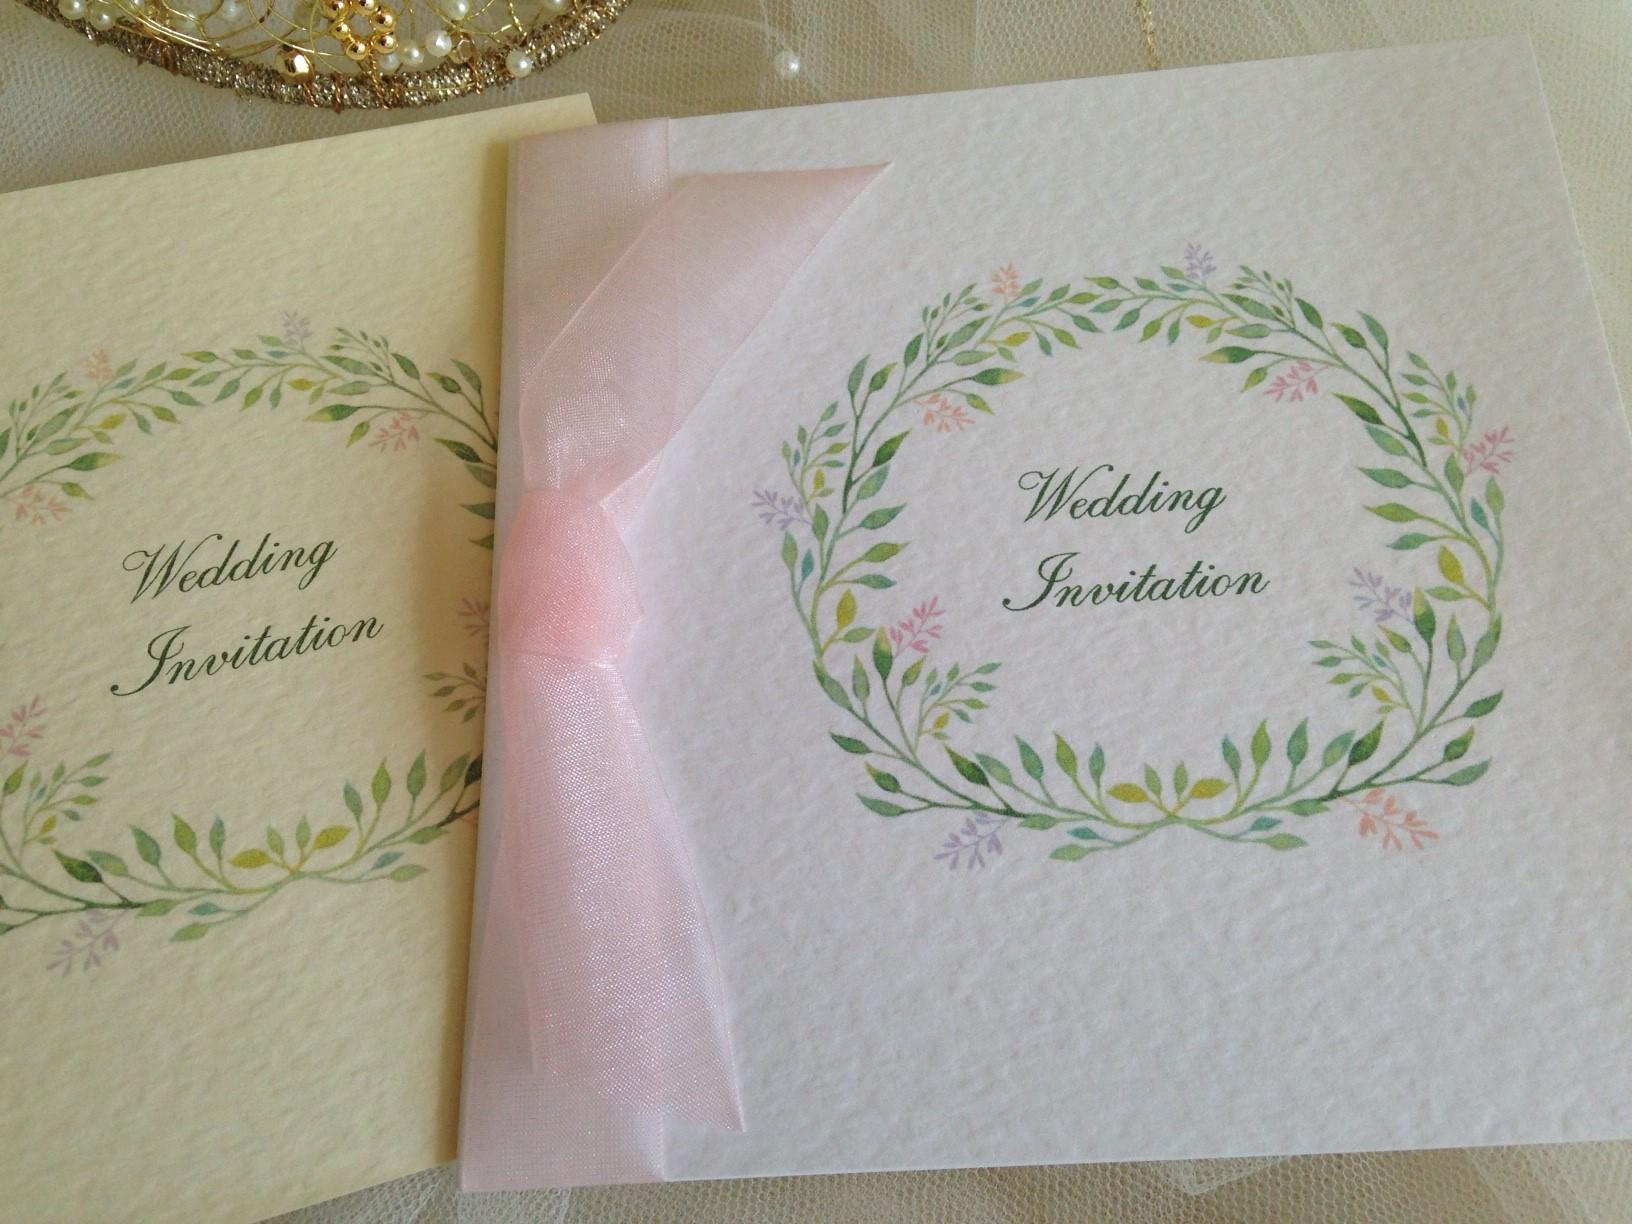 Woodland Wedding Invitations from £1.25